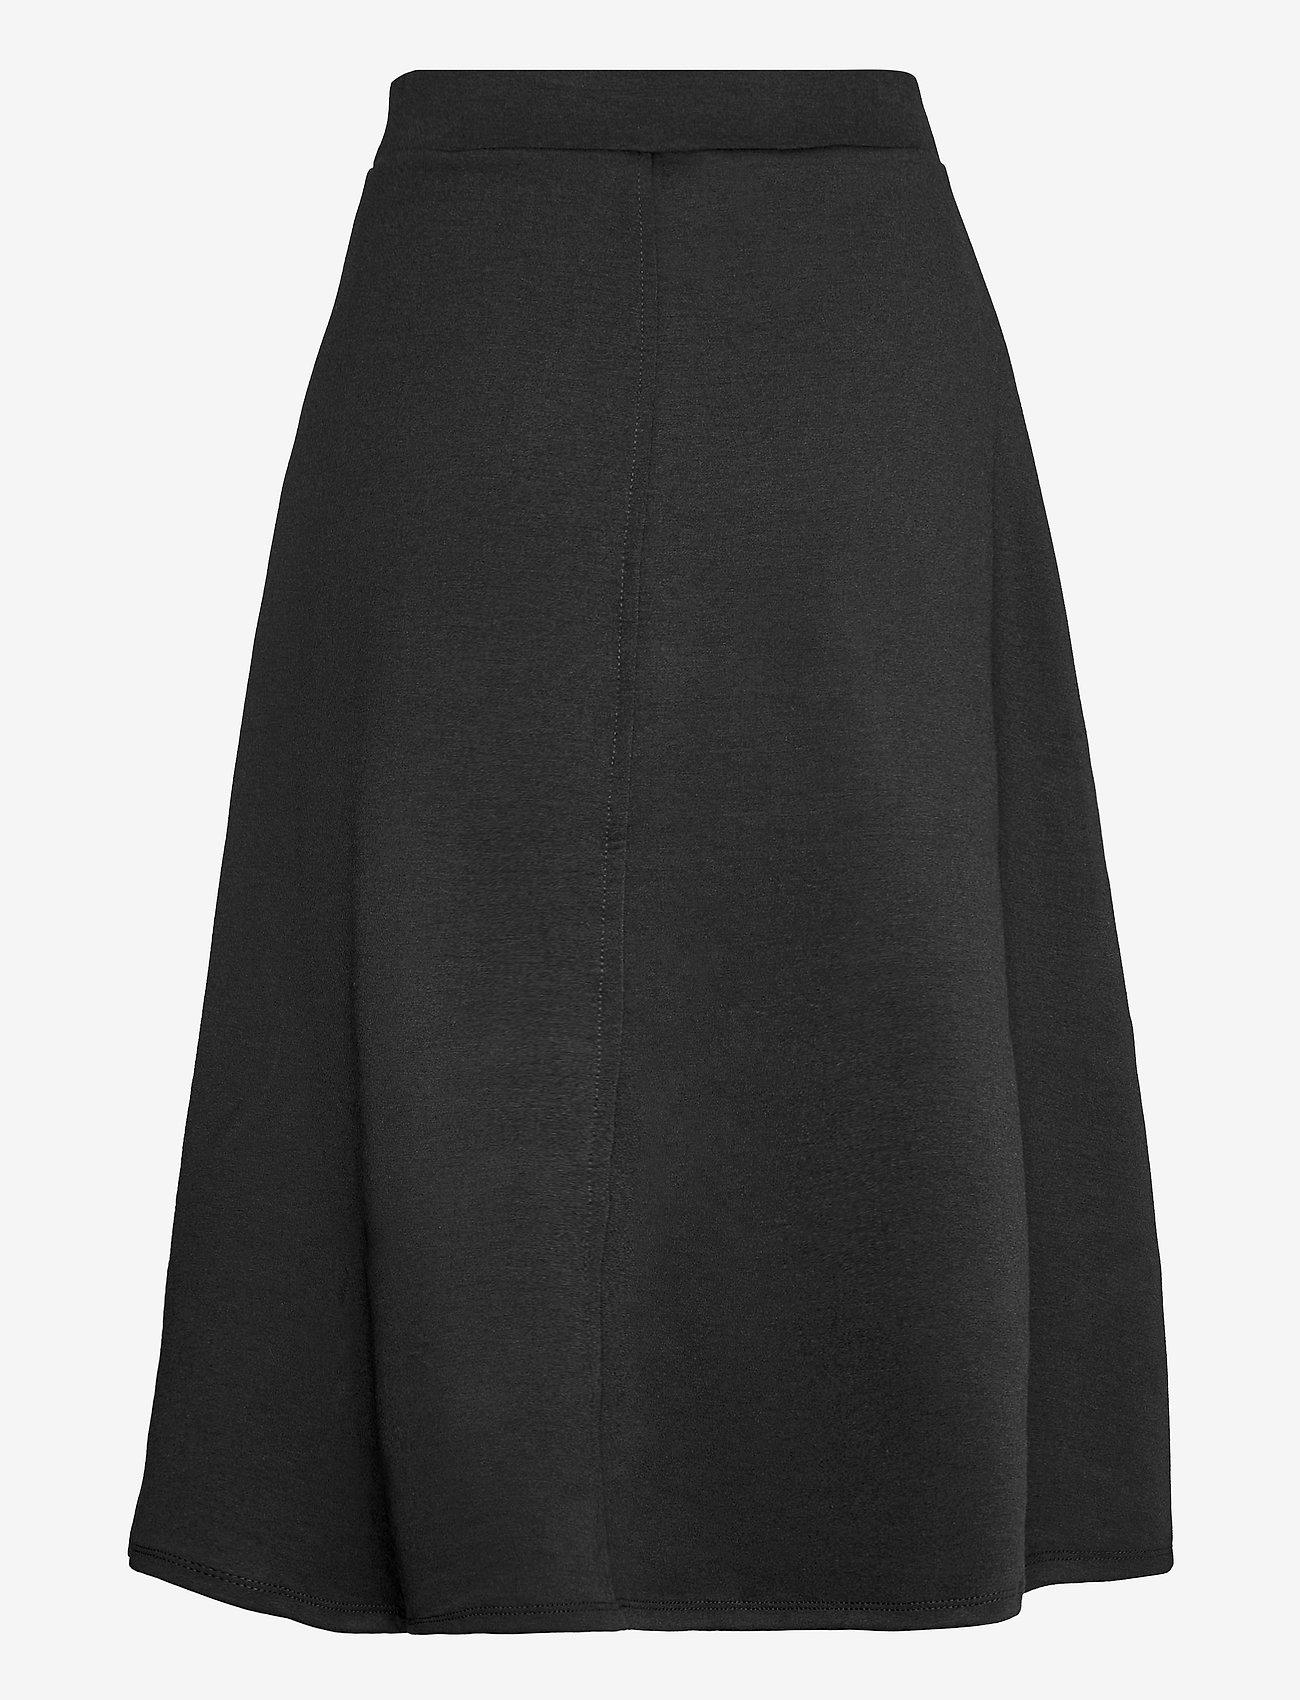 Object - OBJSAVA MW SKIRT - midi skirts - black - 1